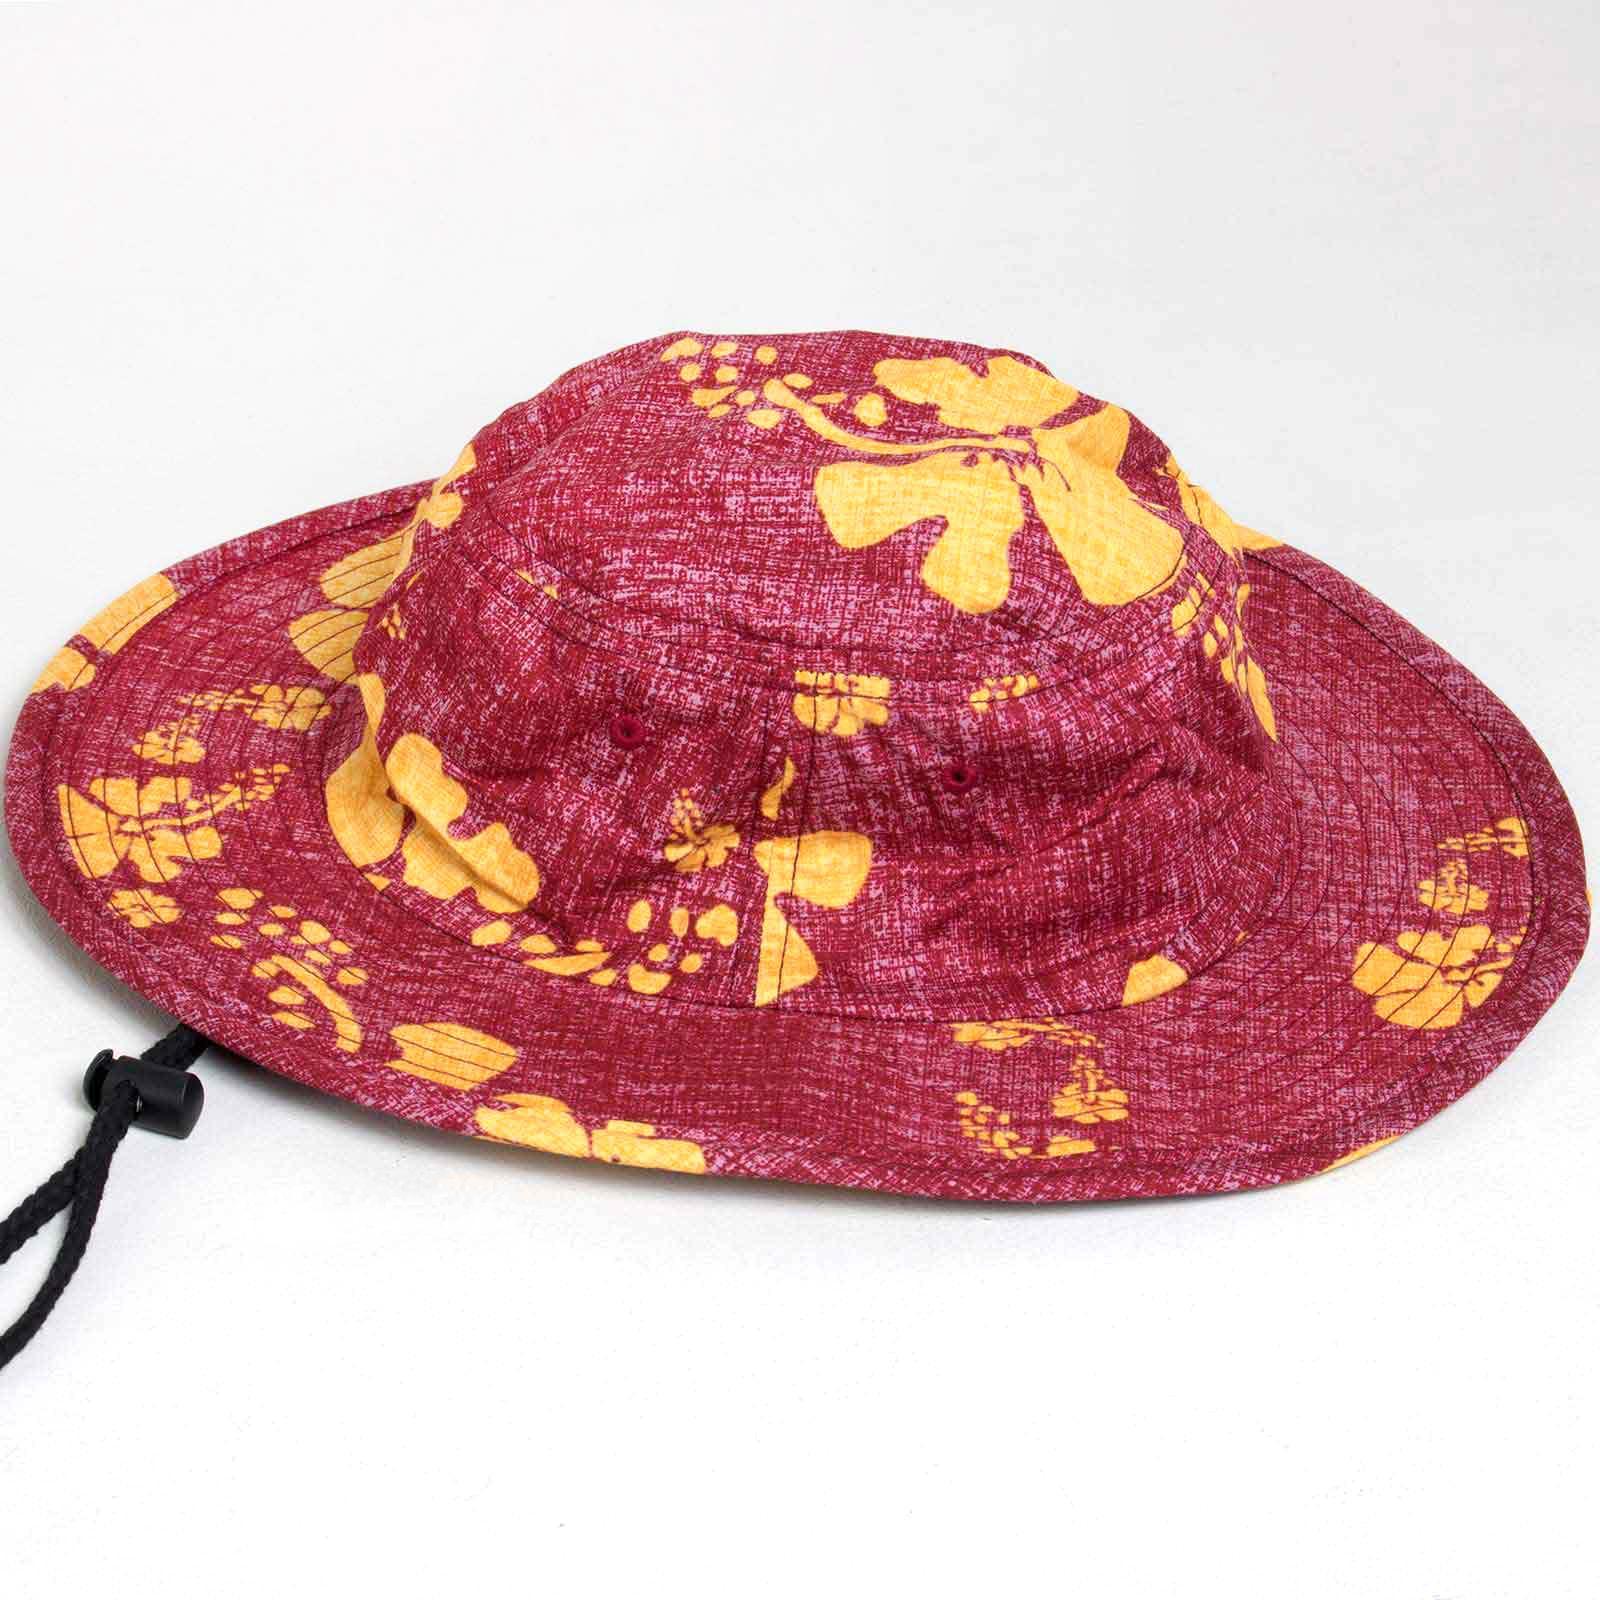 ... new arrivals usc ohana bucket hat 2bb94 59108 98e666f41c5f